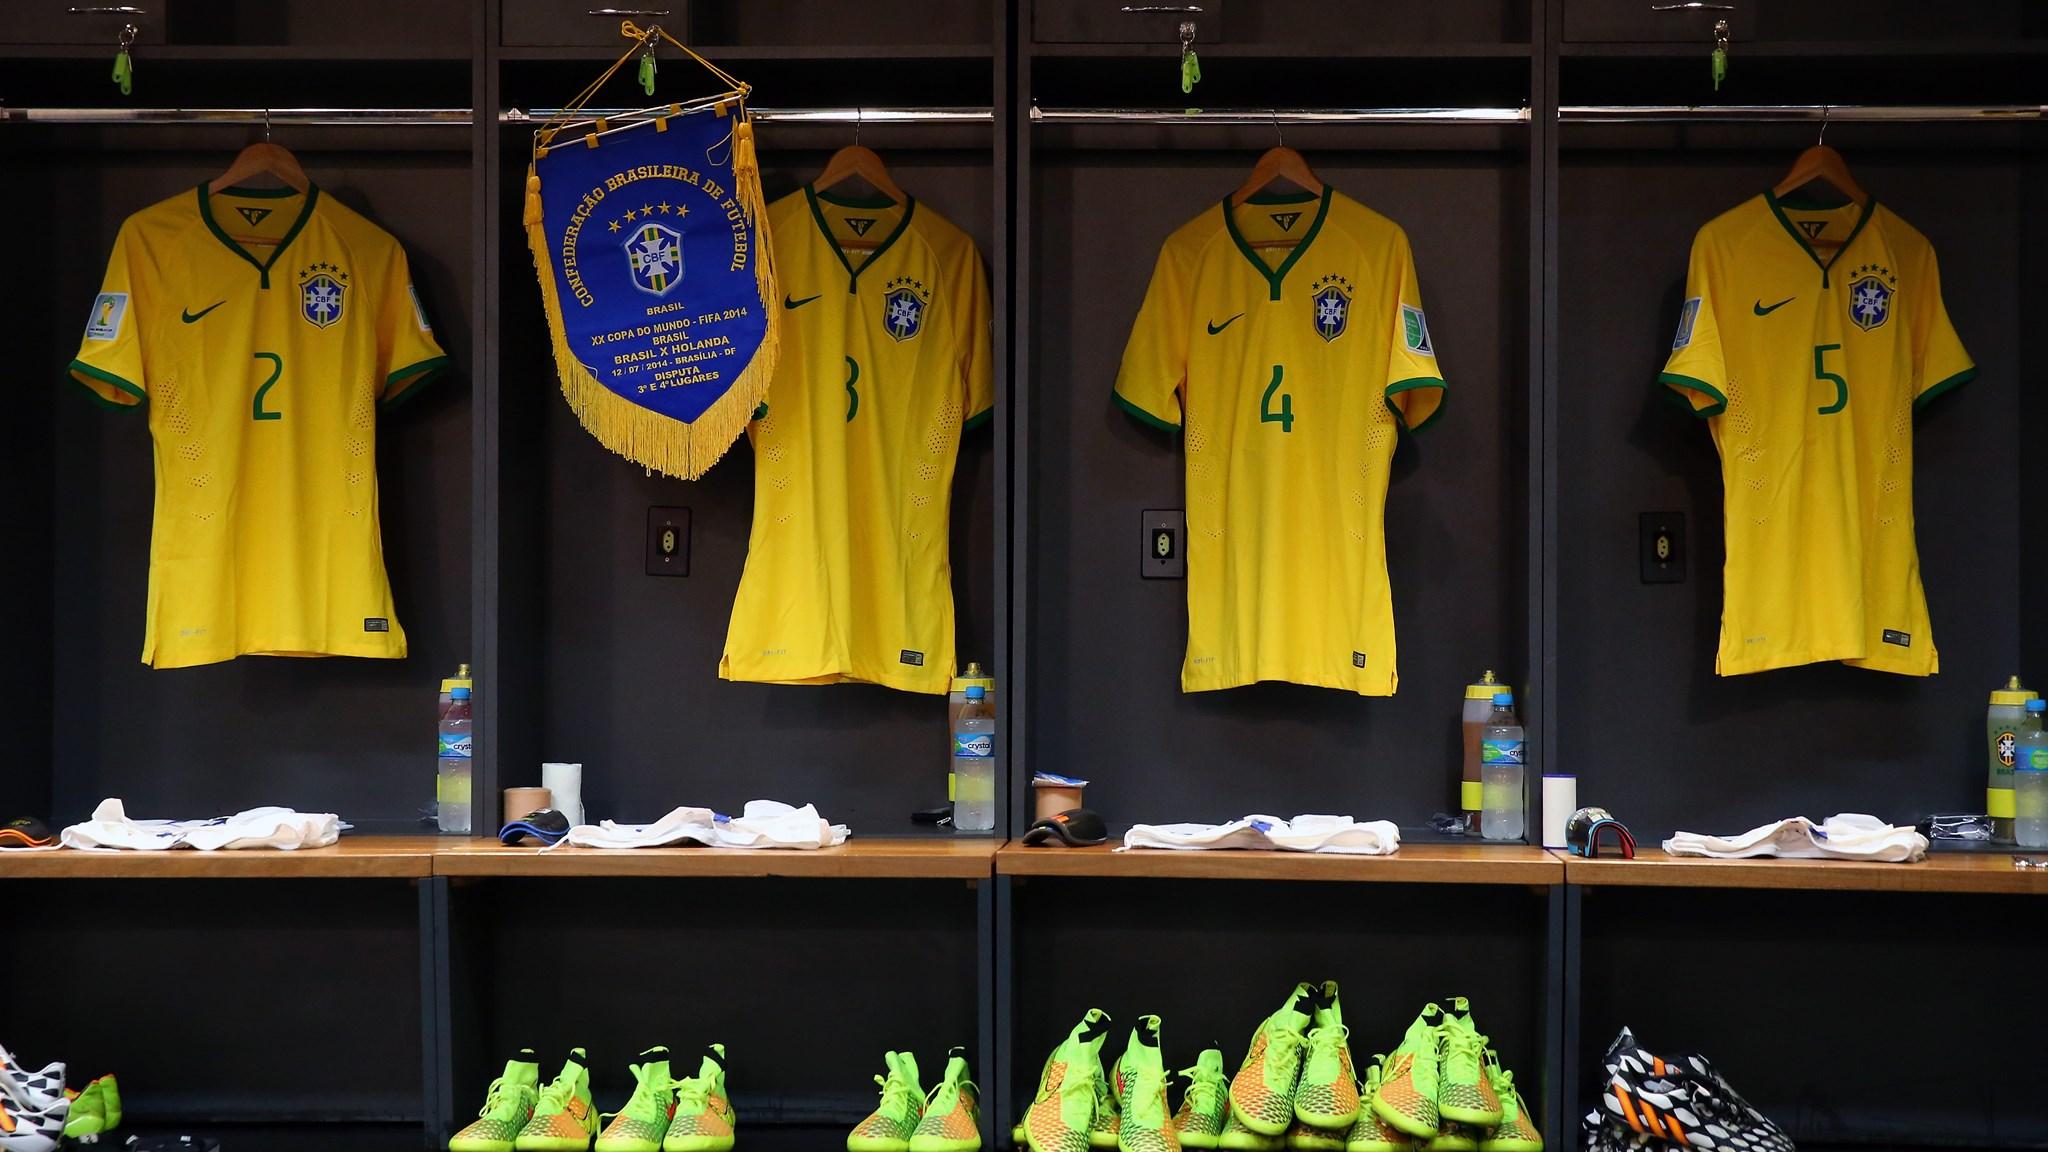 209 - Brazil-Netherlands [0-3] -- 12 Jul 2014 - 17-00 - kuaza